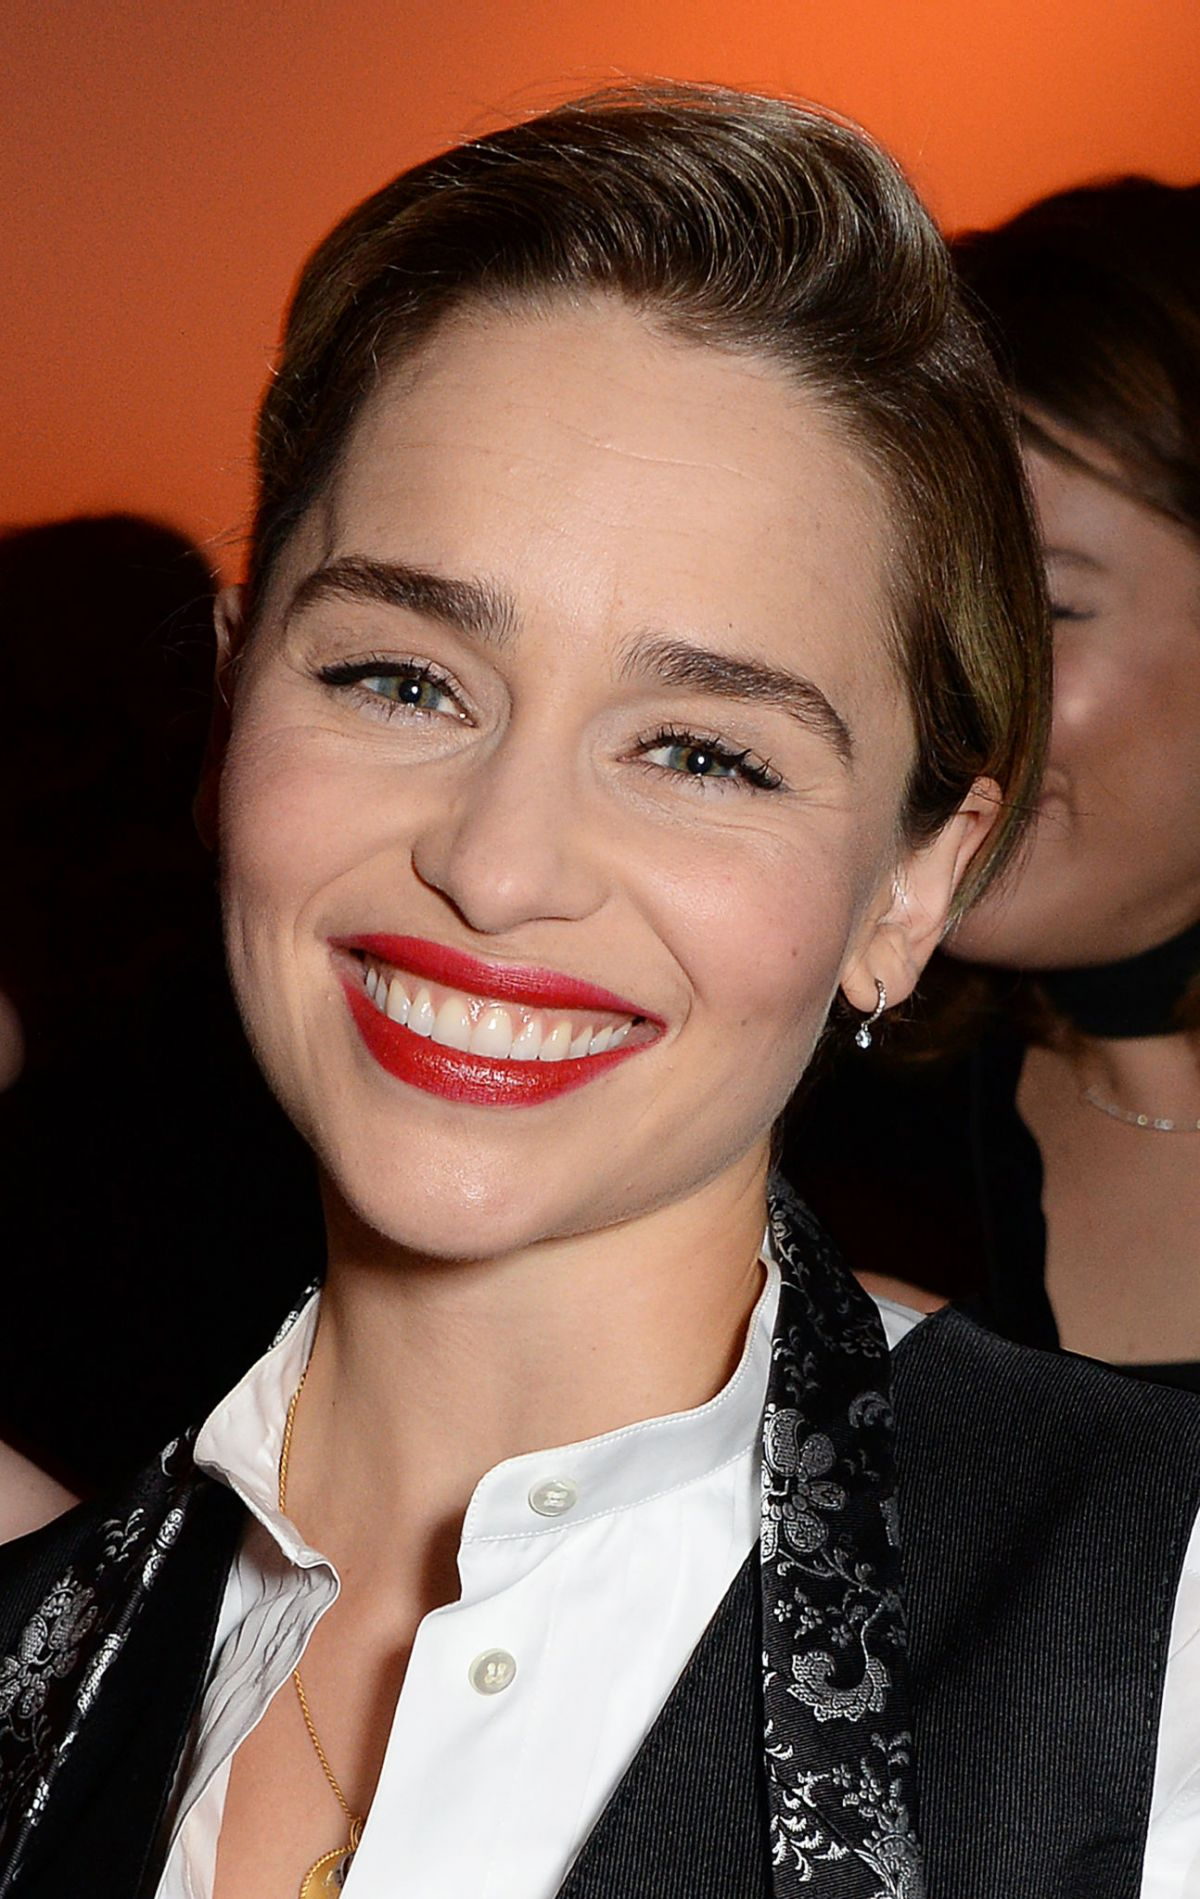 Emilia Clarke Filme & Fernsehsendungen